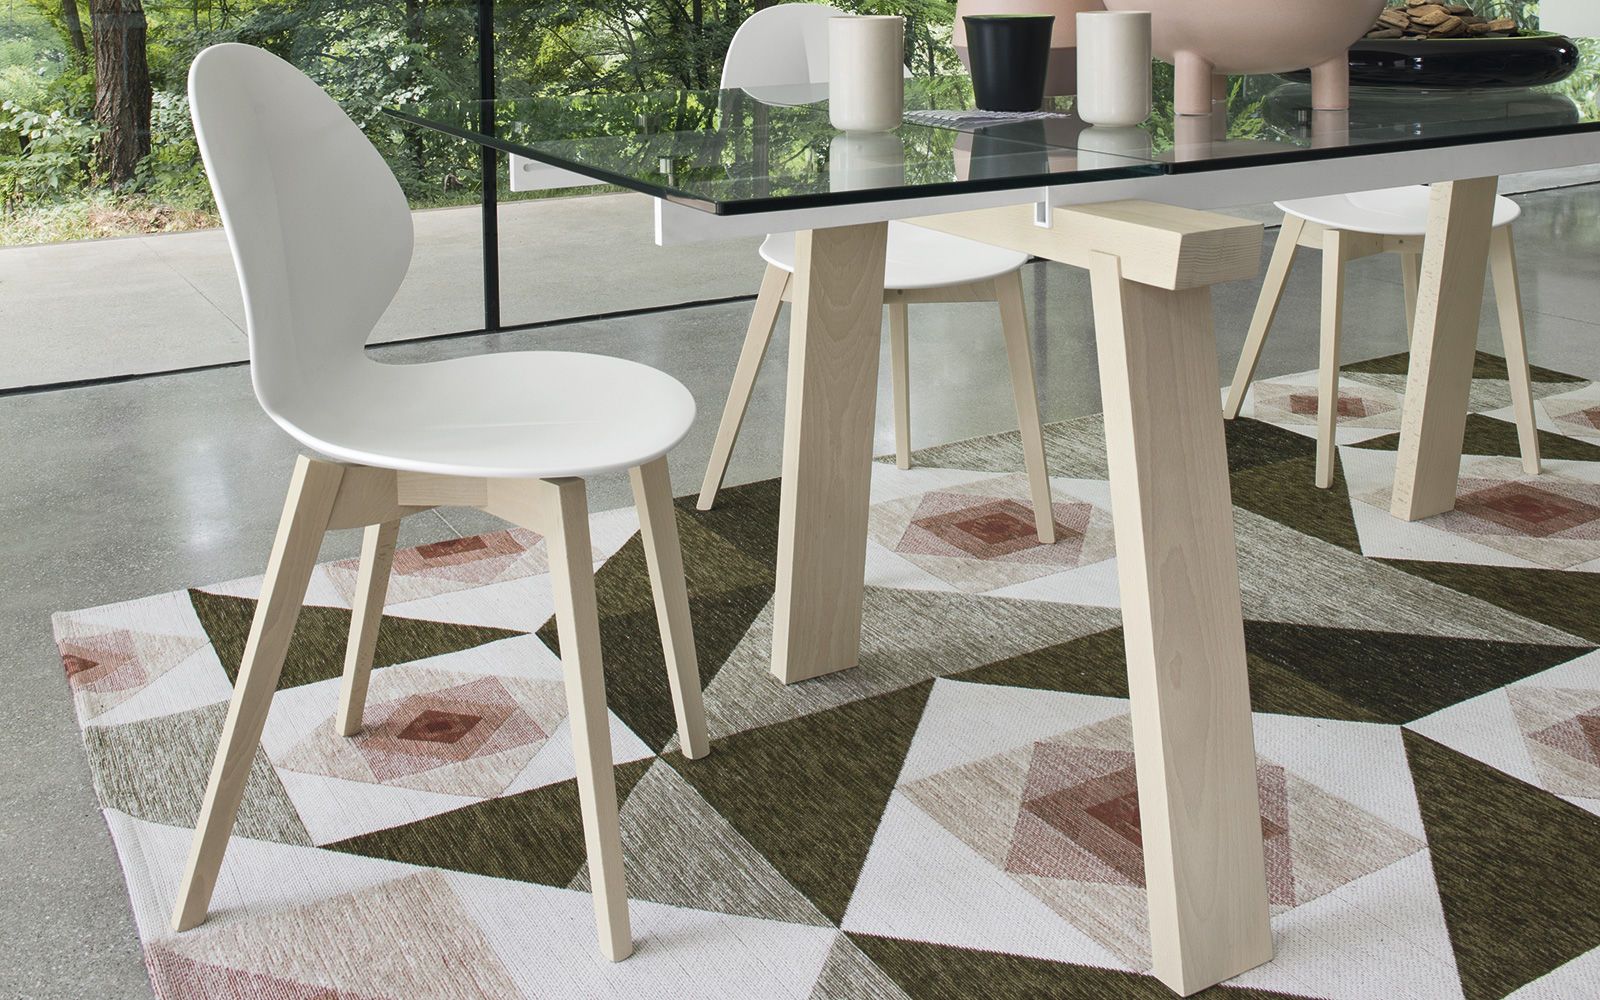 Sedia moderna / ergonomica / in legno / in pelle - BASIL W by Smith ...